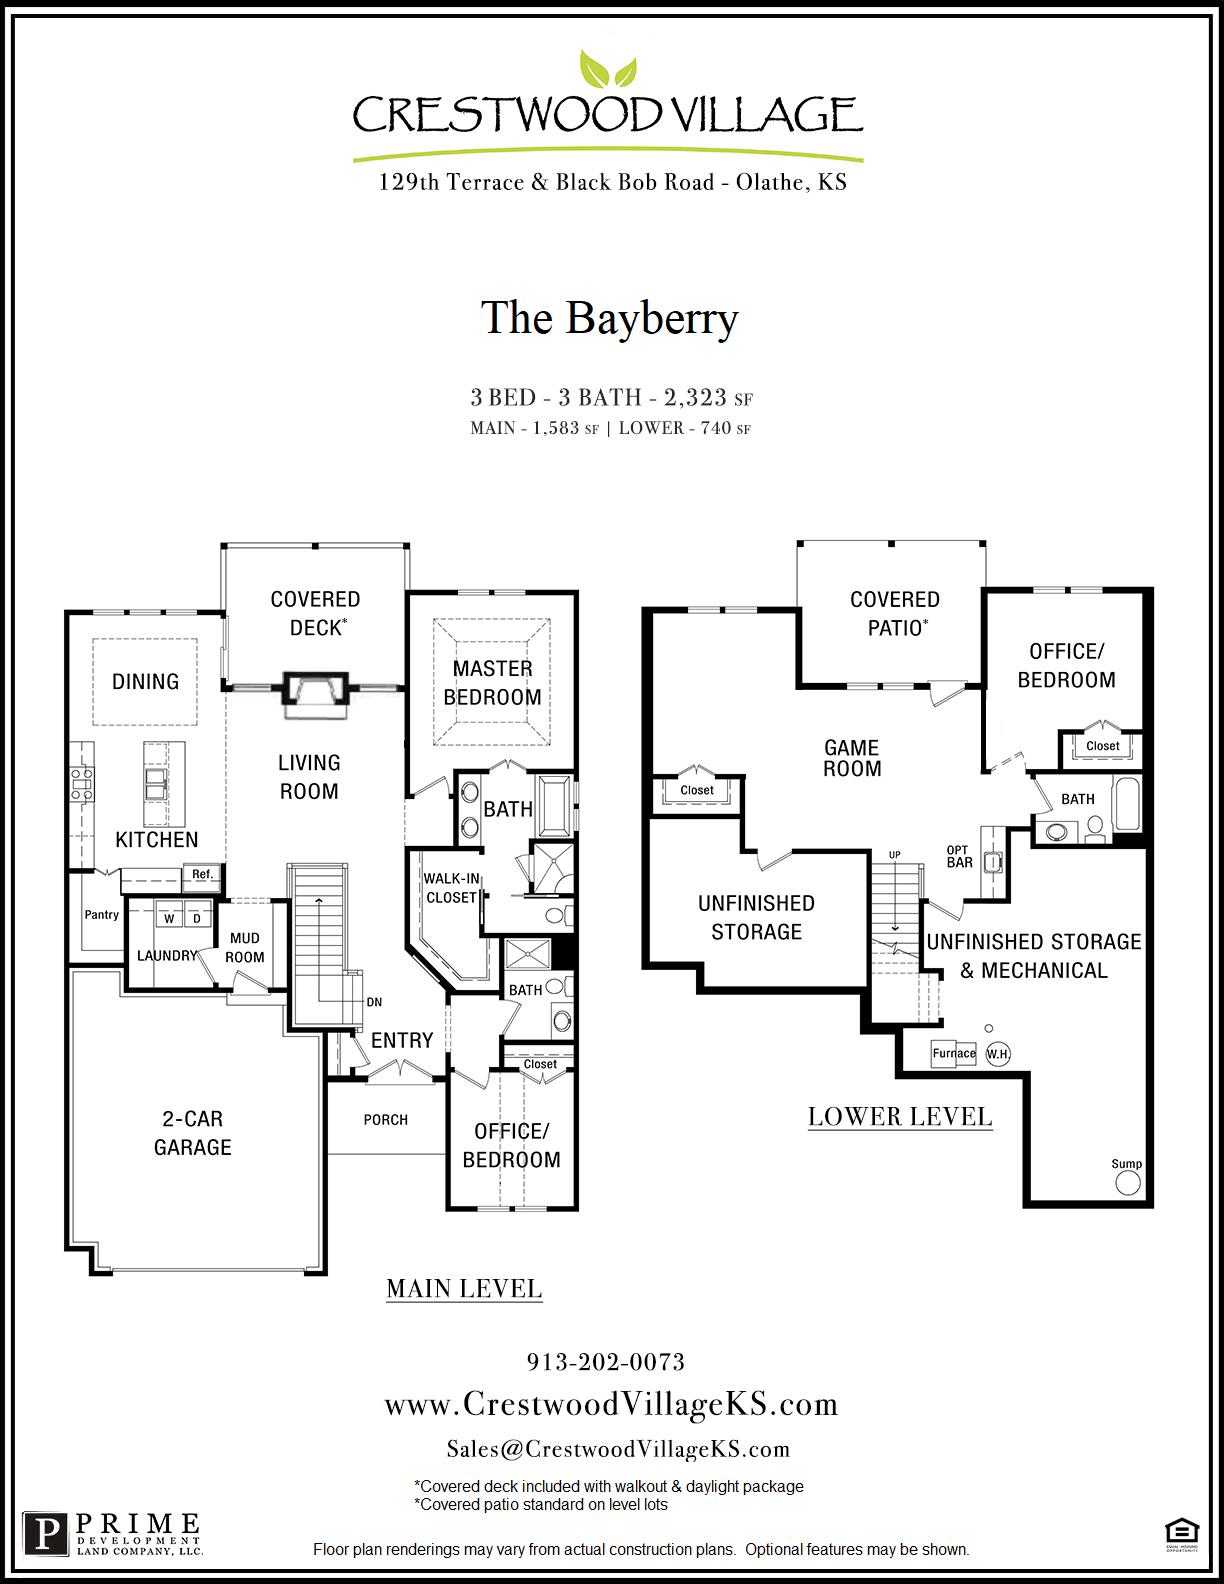 CV-Bayberry-Floorplan-Handout-5-4-2020.png